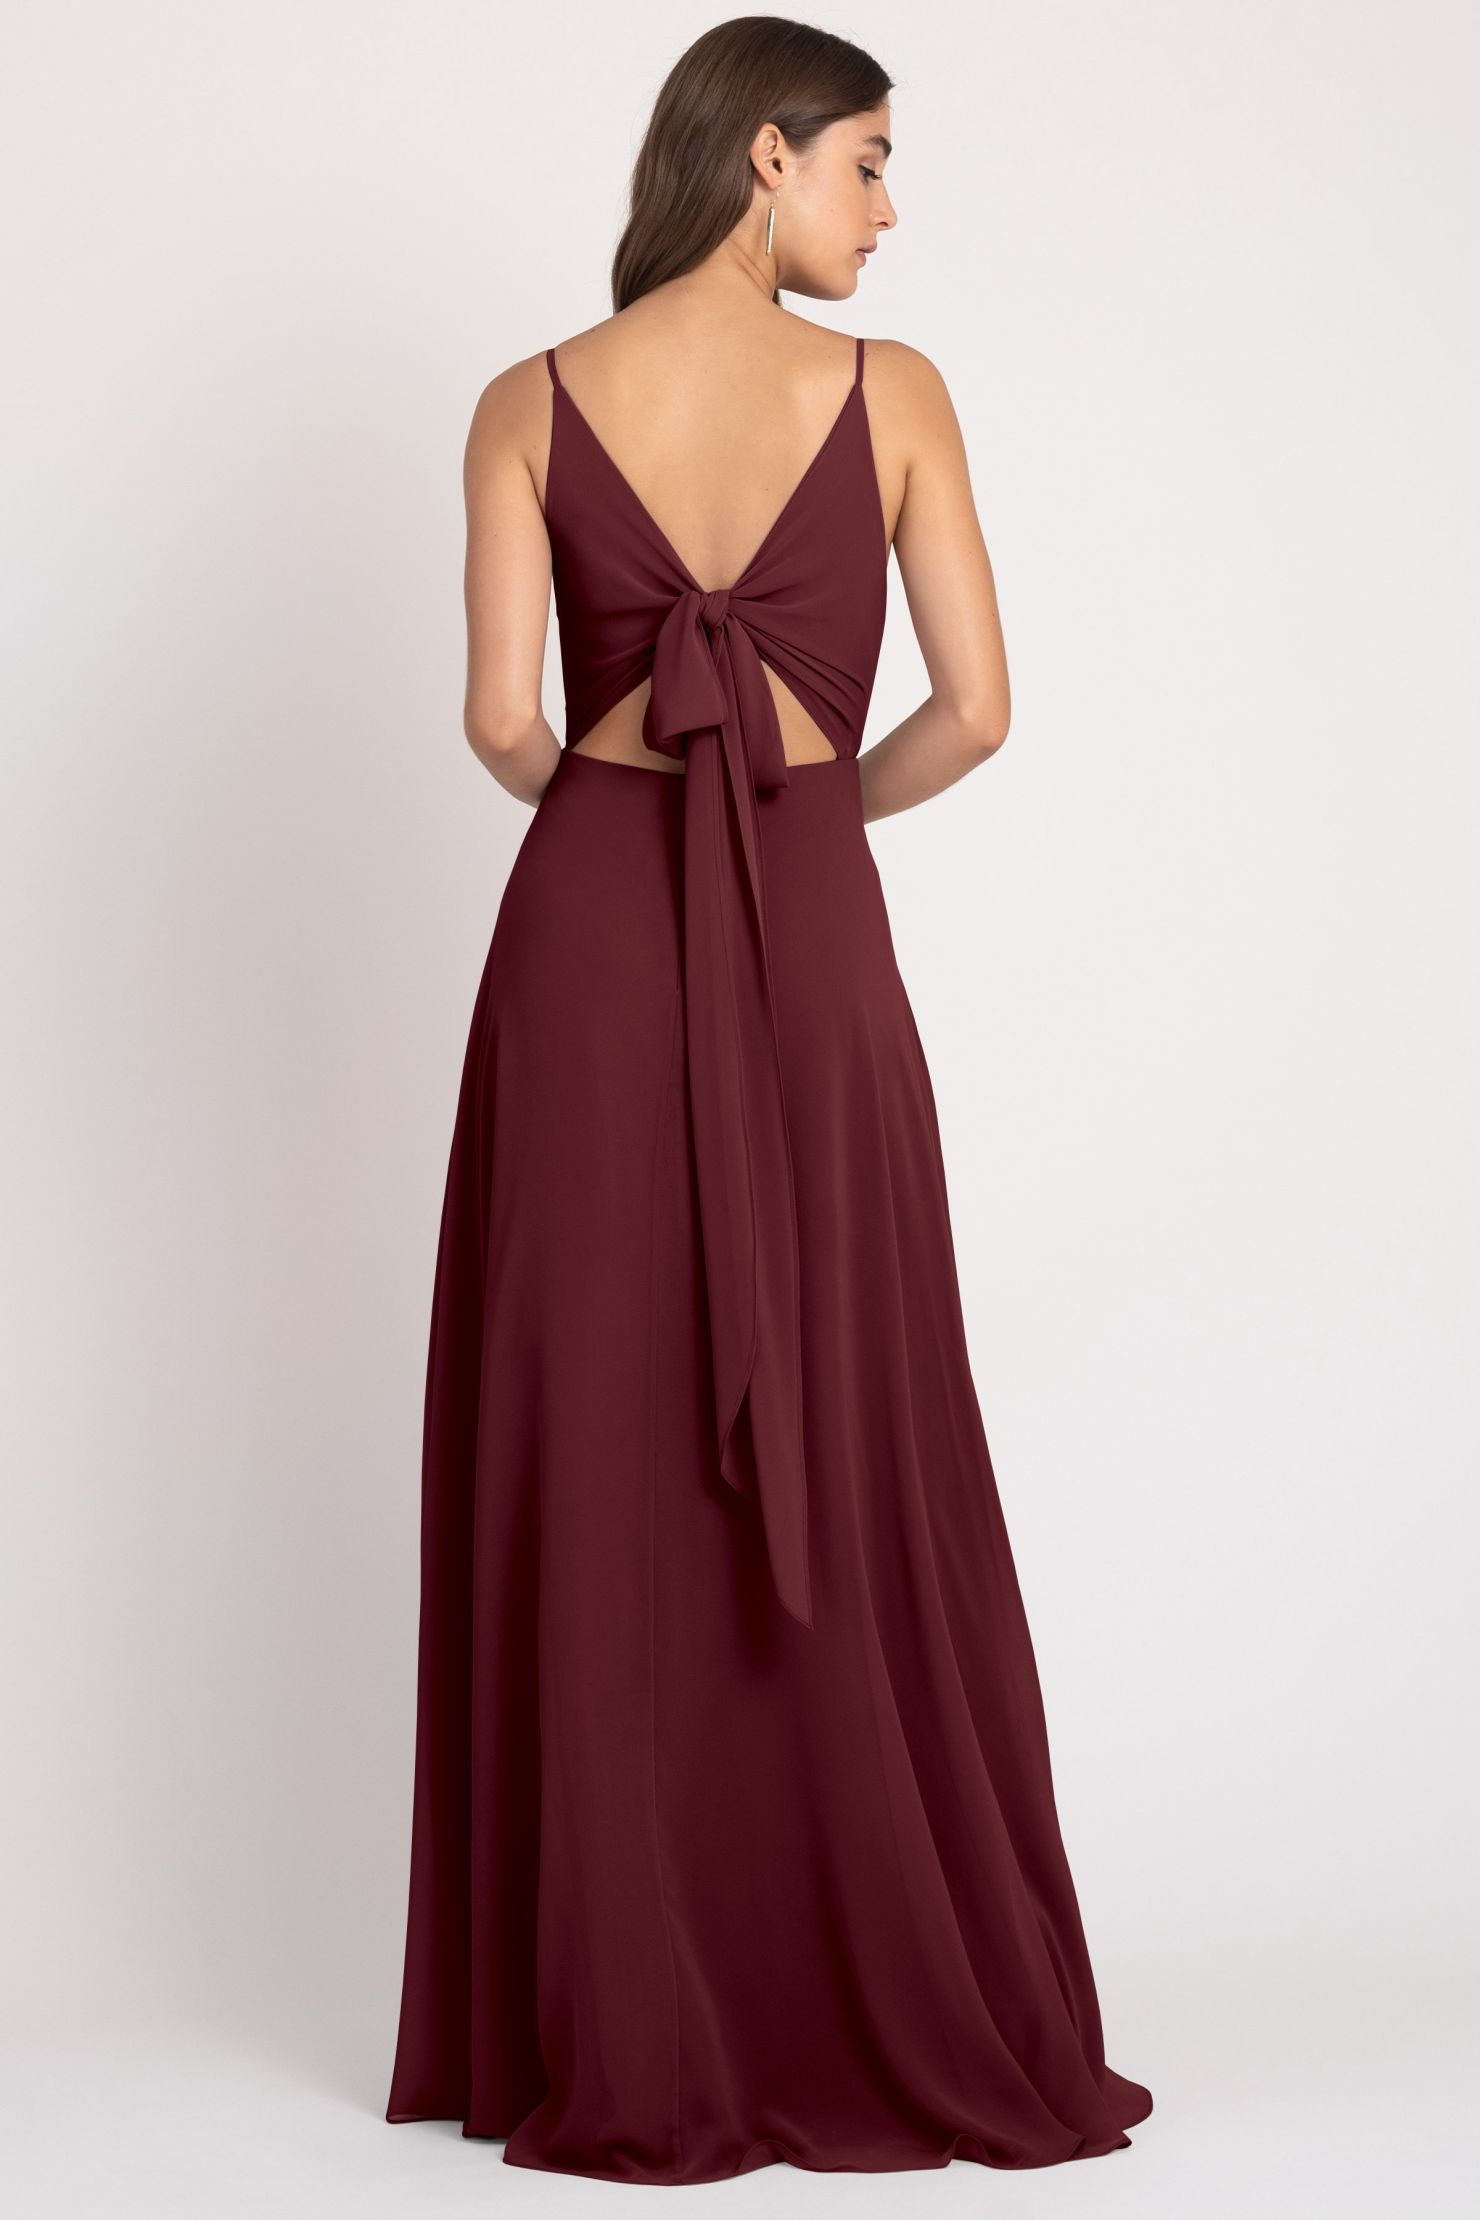 Dani Bridesmaids Dress by Jenny Yoo - Hibiscus